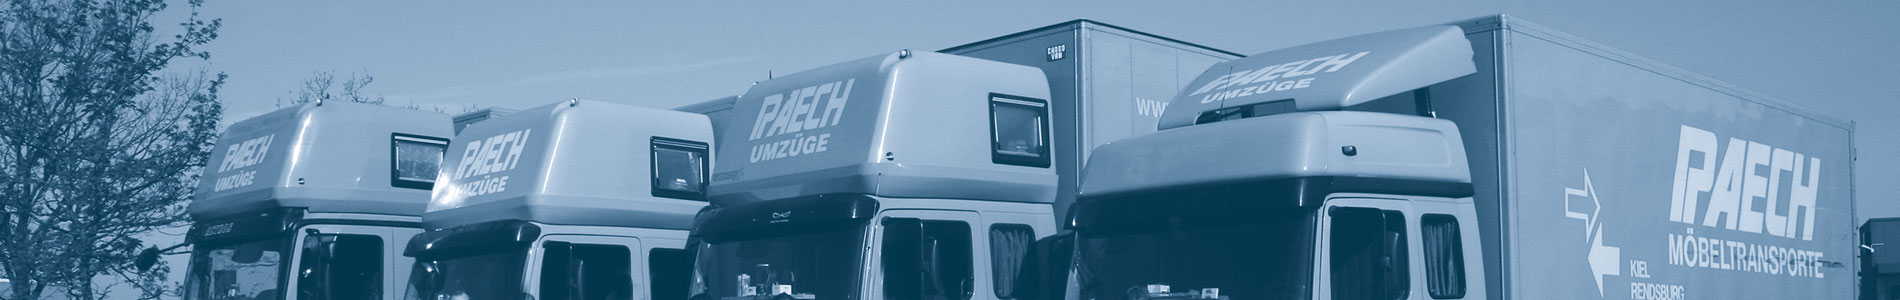 Ute Paech GmbH & Co. KG - Full-Service-Umzug